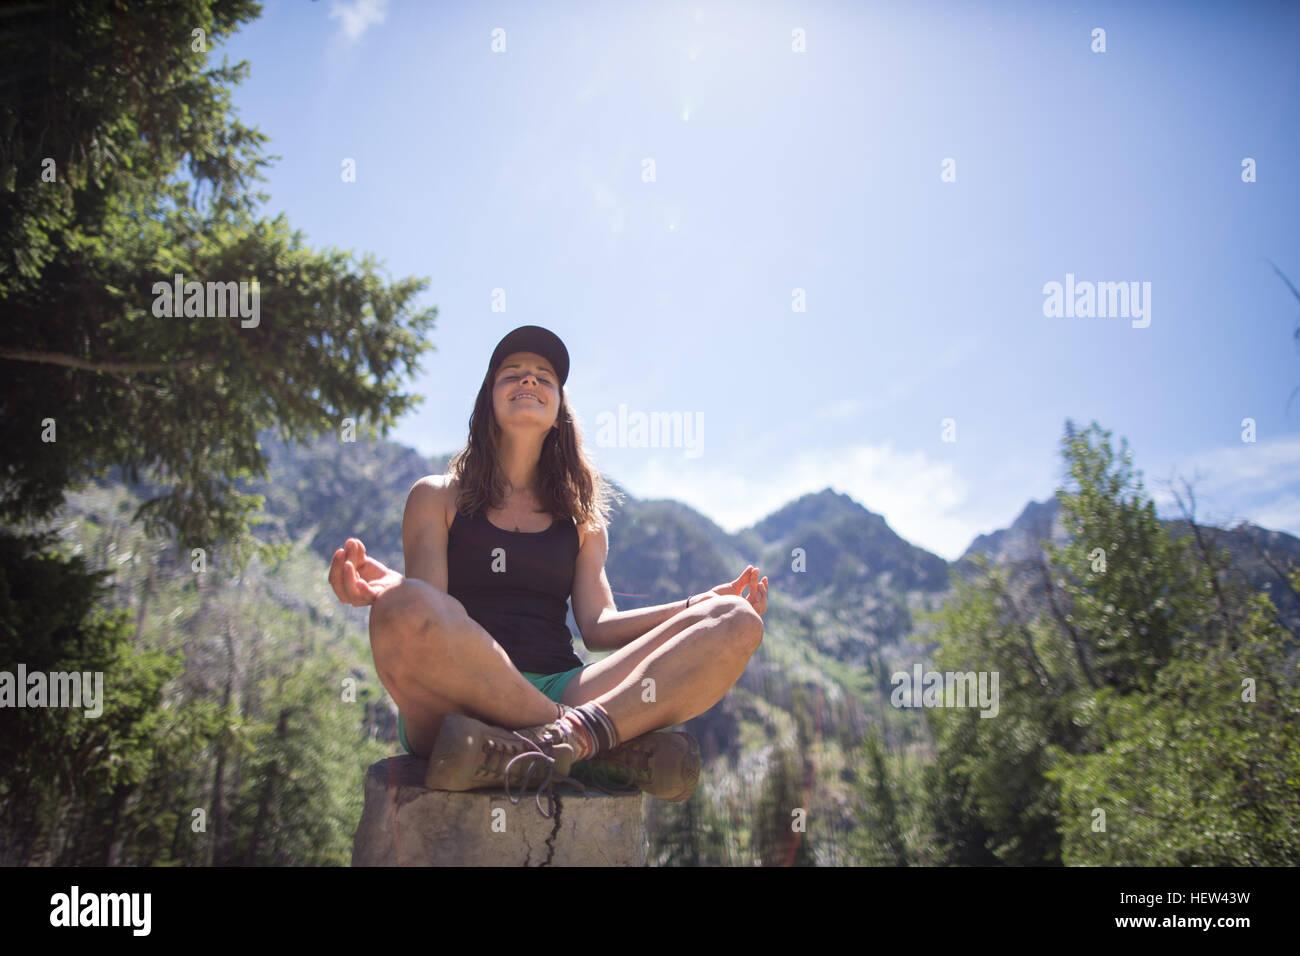 Hiker practising yoga on tree stump, Enchantments, Alpine Lakes Wilderness, Washington, USA - Stock Image